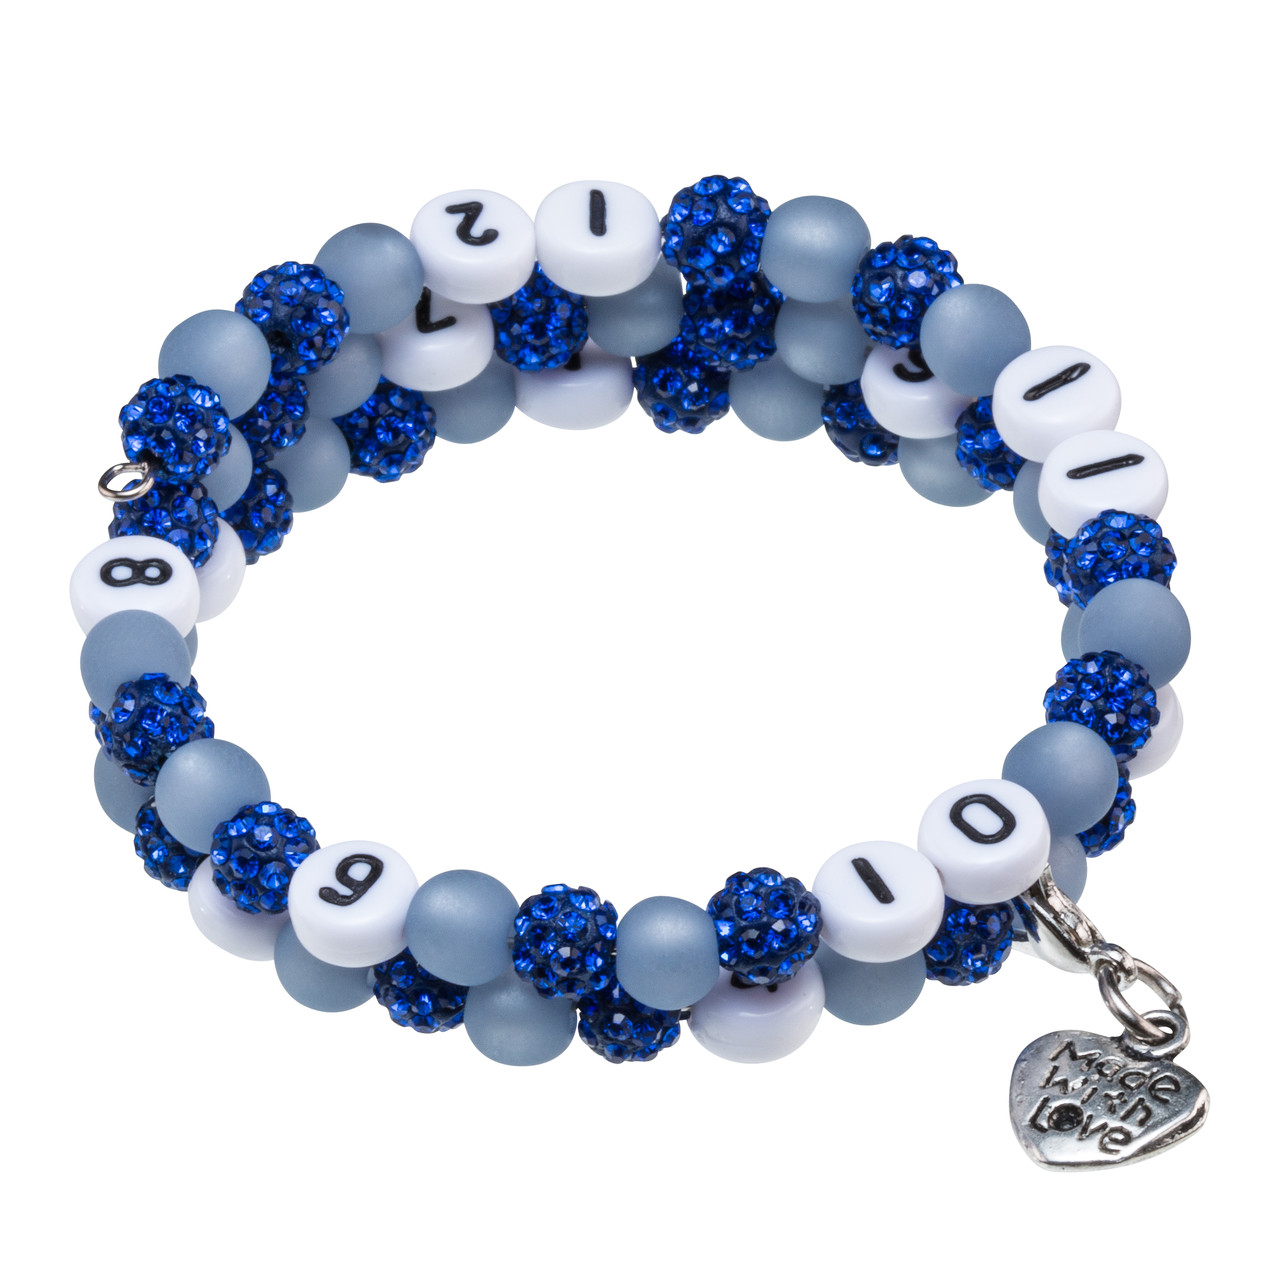 Stillarmband Glamour in blau